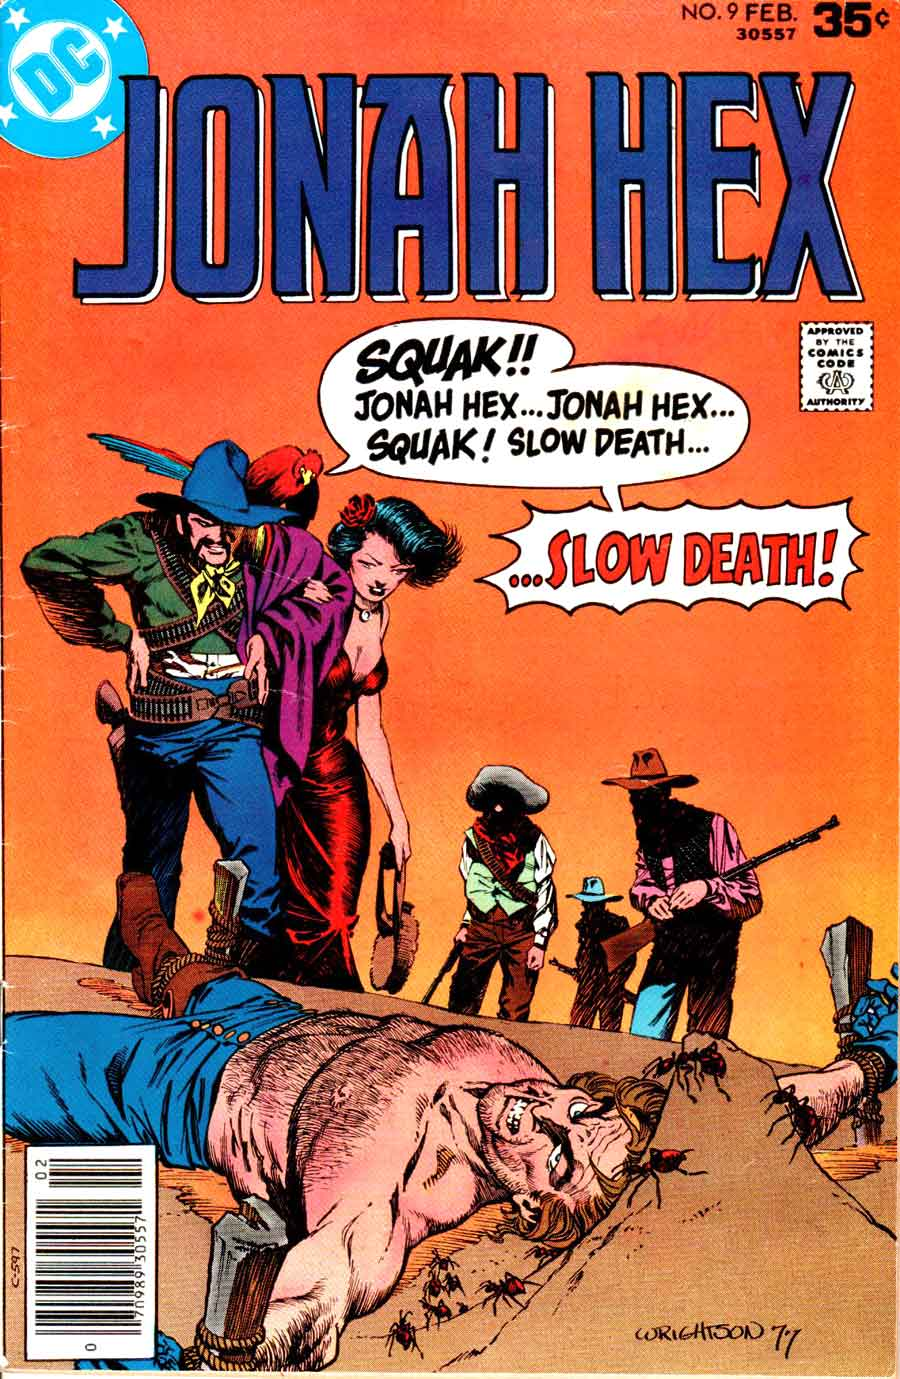 Jonah Hex v1 #9 dc western comic book cover art by Bernie Wrightson